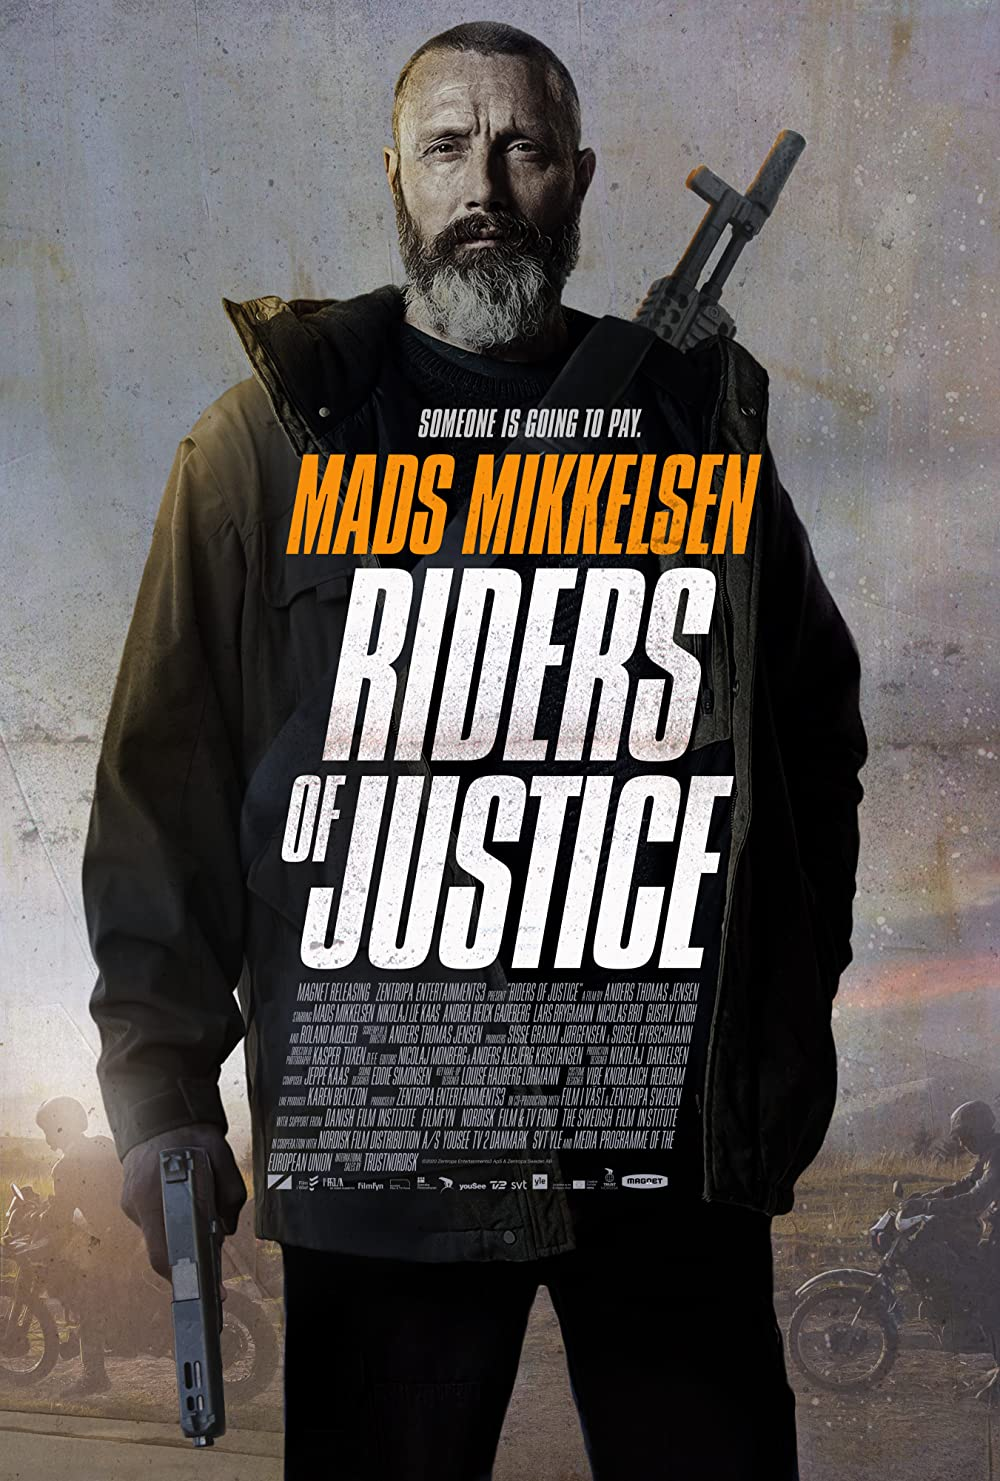 Teisingumo raiteliai (2020) / Riders of Justice